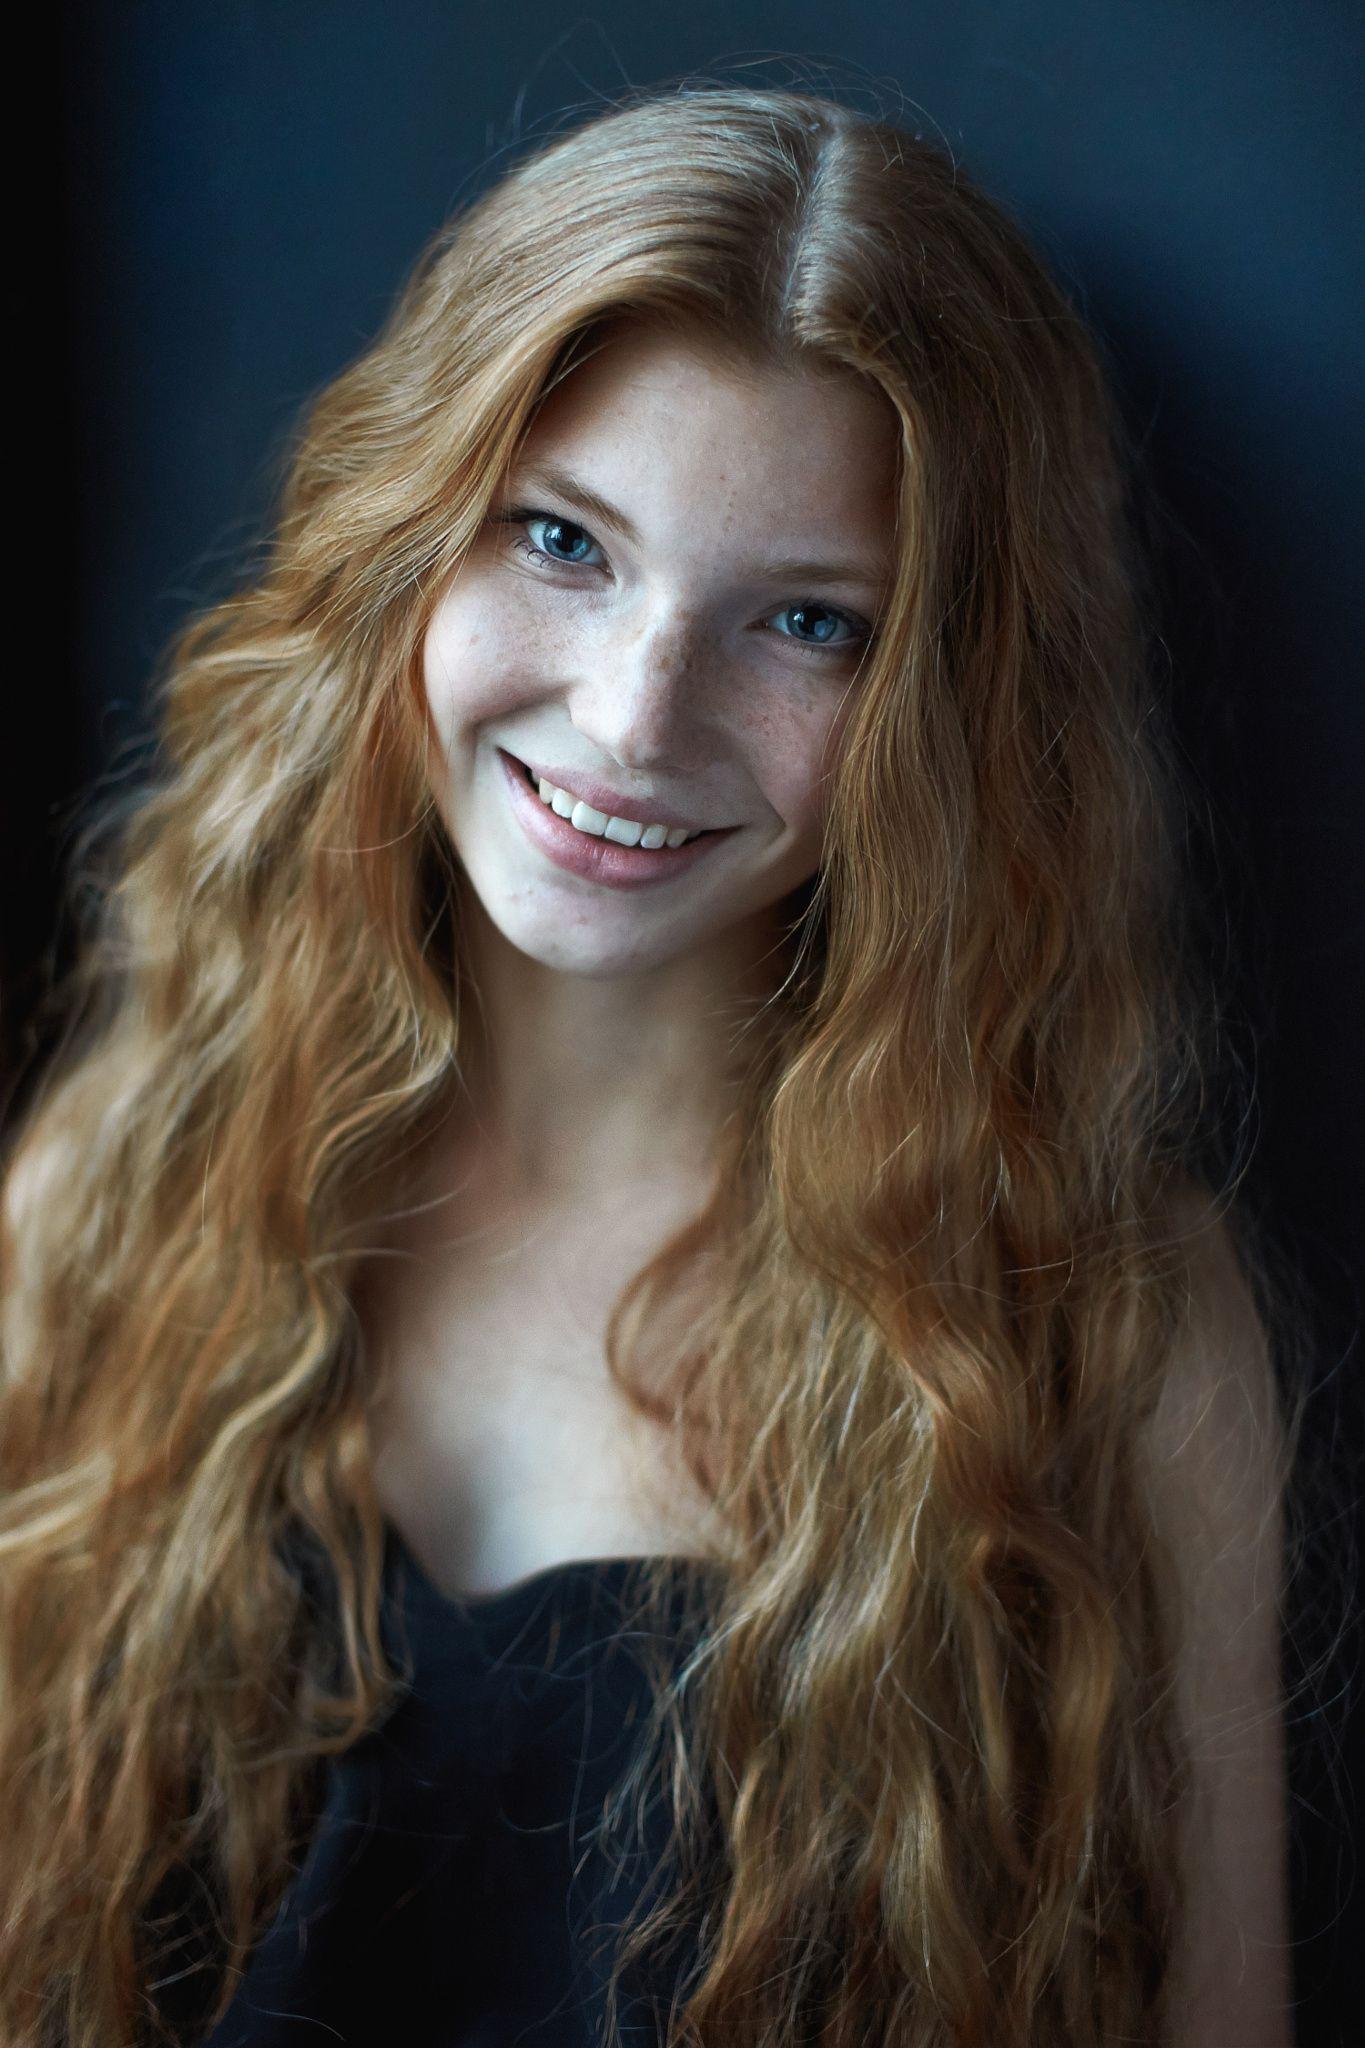 anya model redhead